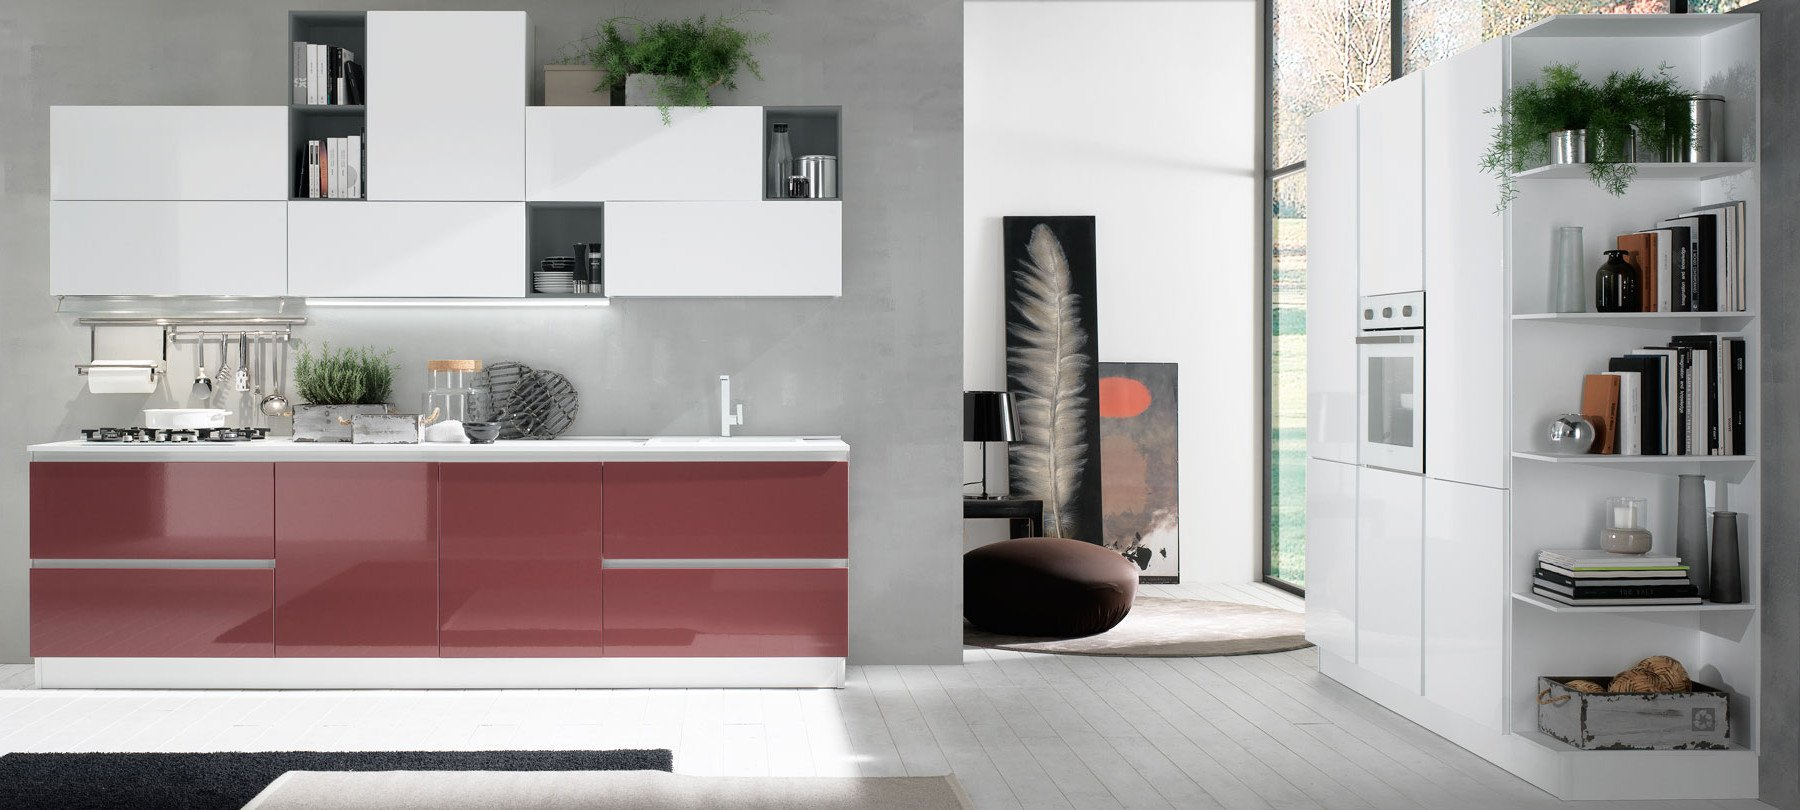 Cucine Moderne Cucine Berloni Avezzano Savina Mobili